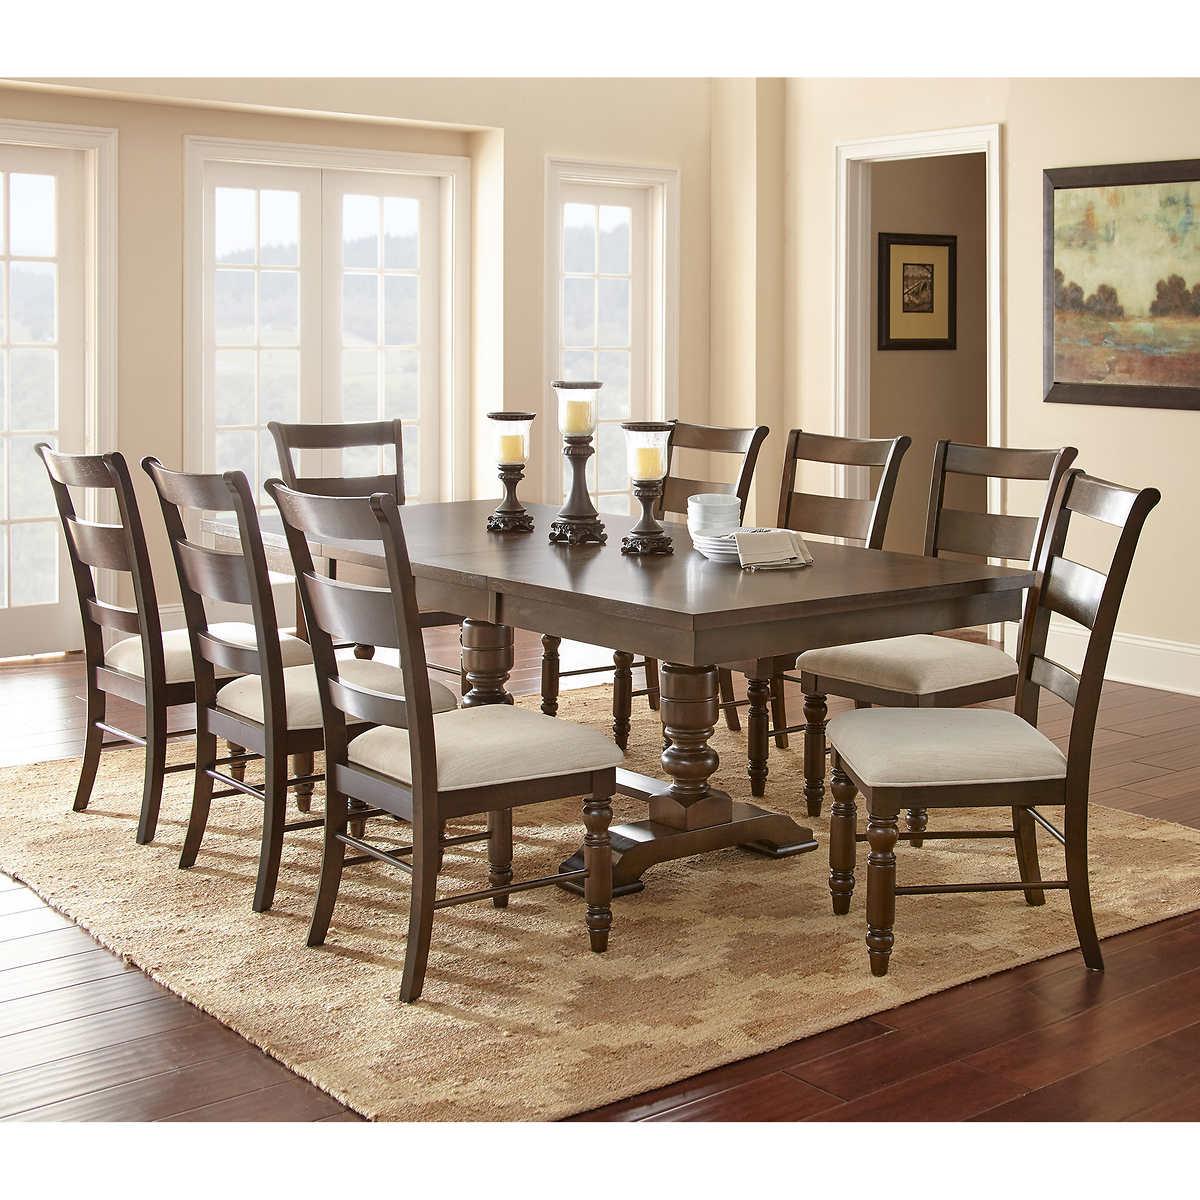 Kaylee 9-piece Dining Set